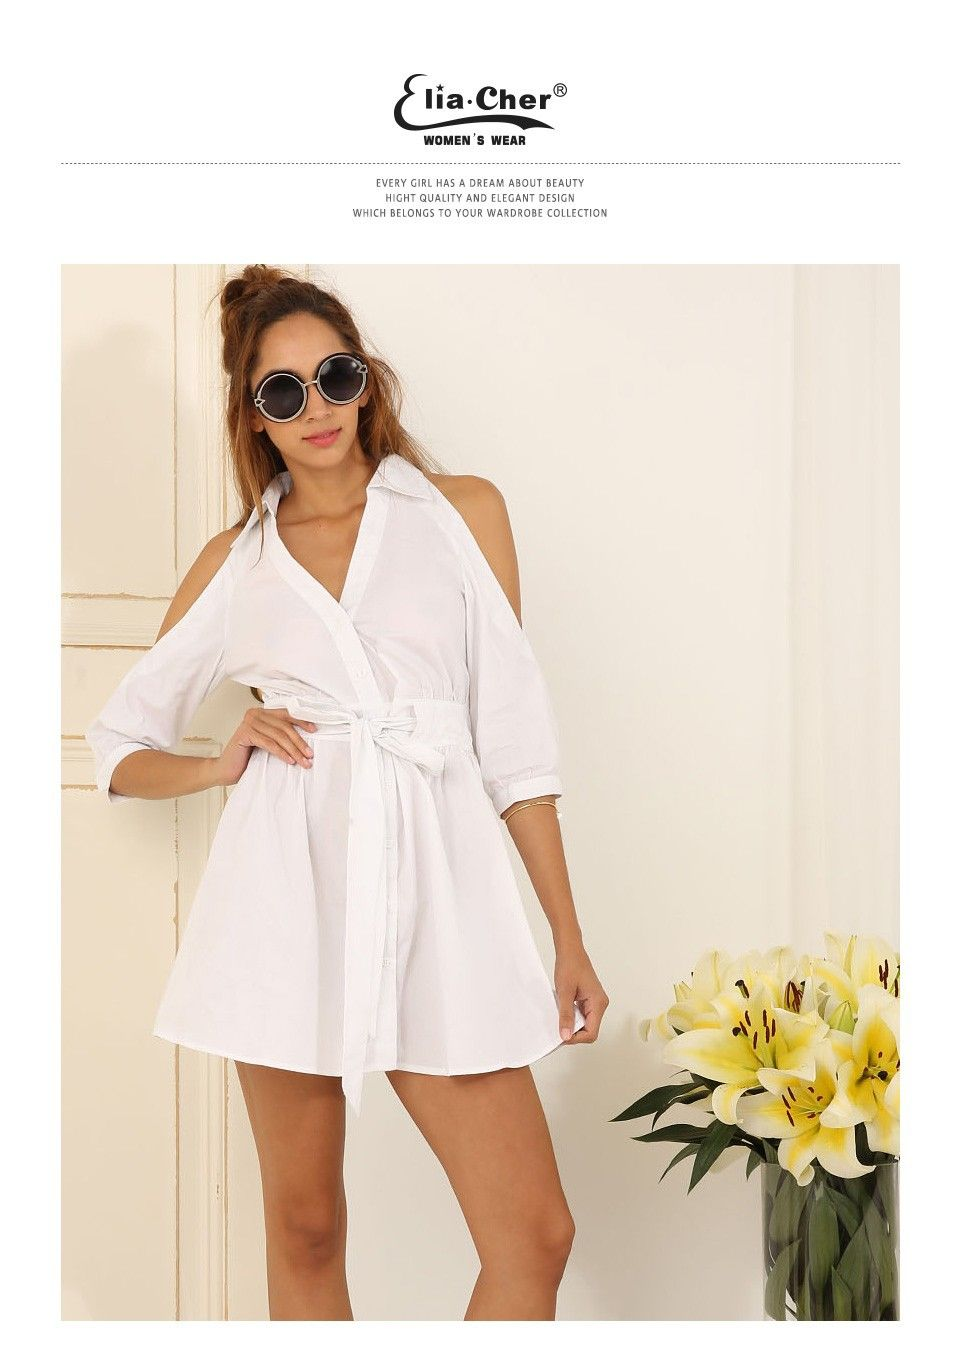 Aliexpress Com Acheter Robe D été 2016 Femmes Chemise Blanche Robe